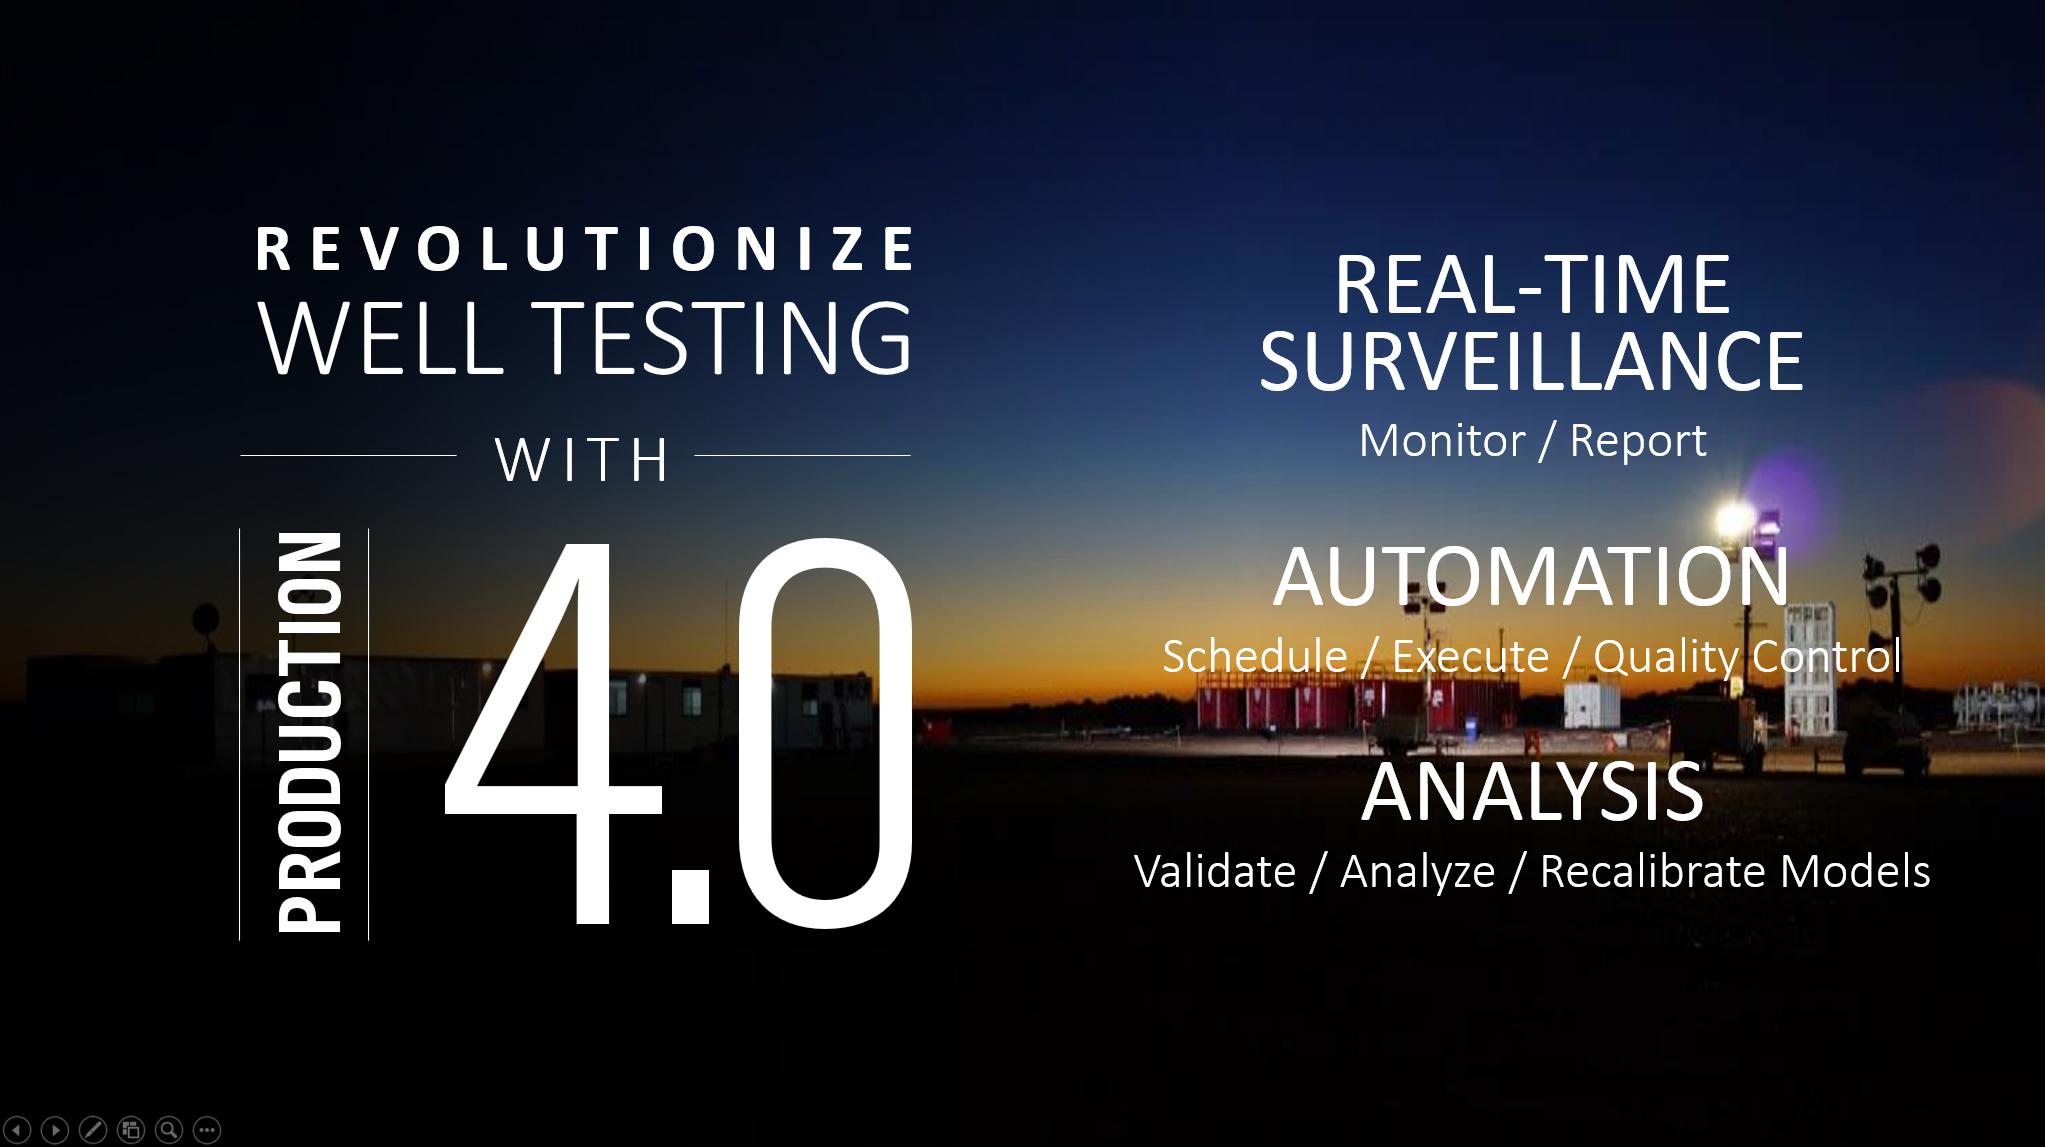 Revolutionize Well Testing